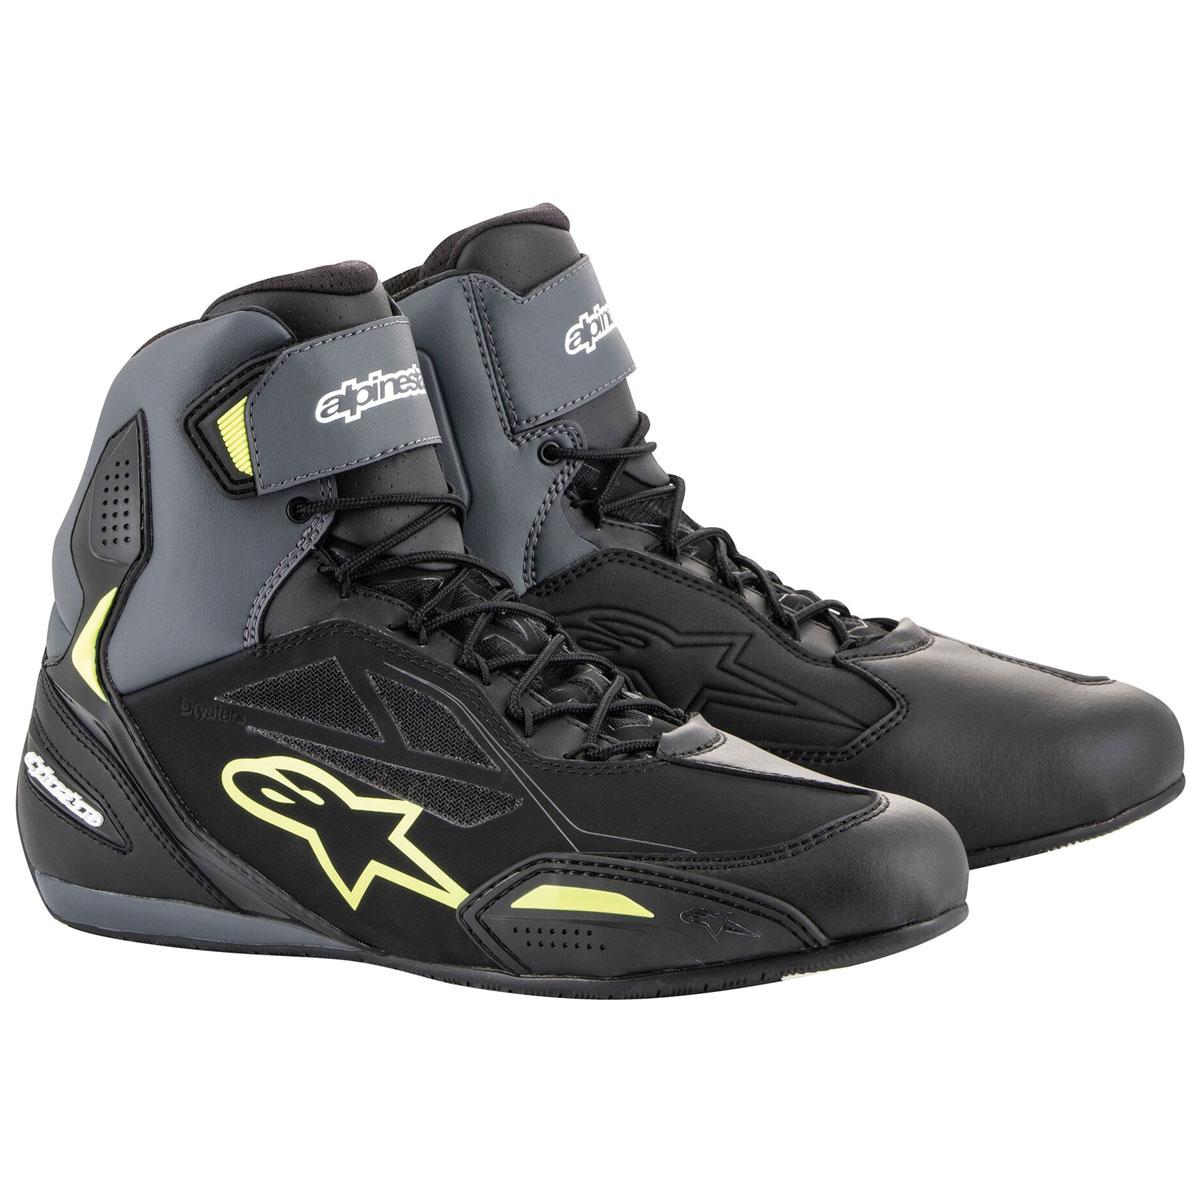 Alpinestars Men's Faster-3 Drystar Black/Gray/Yellow Boots